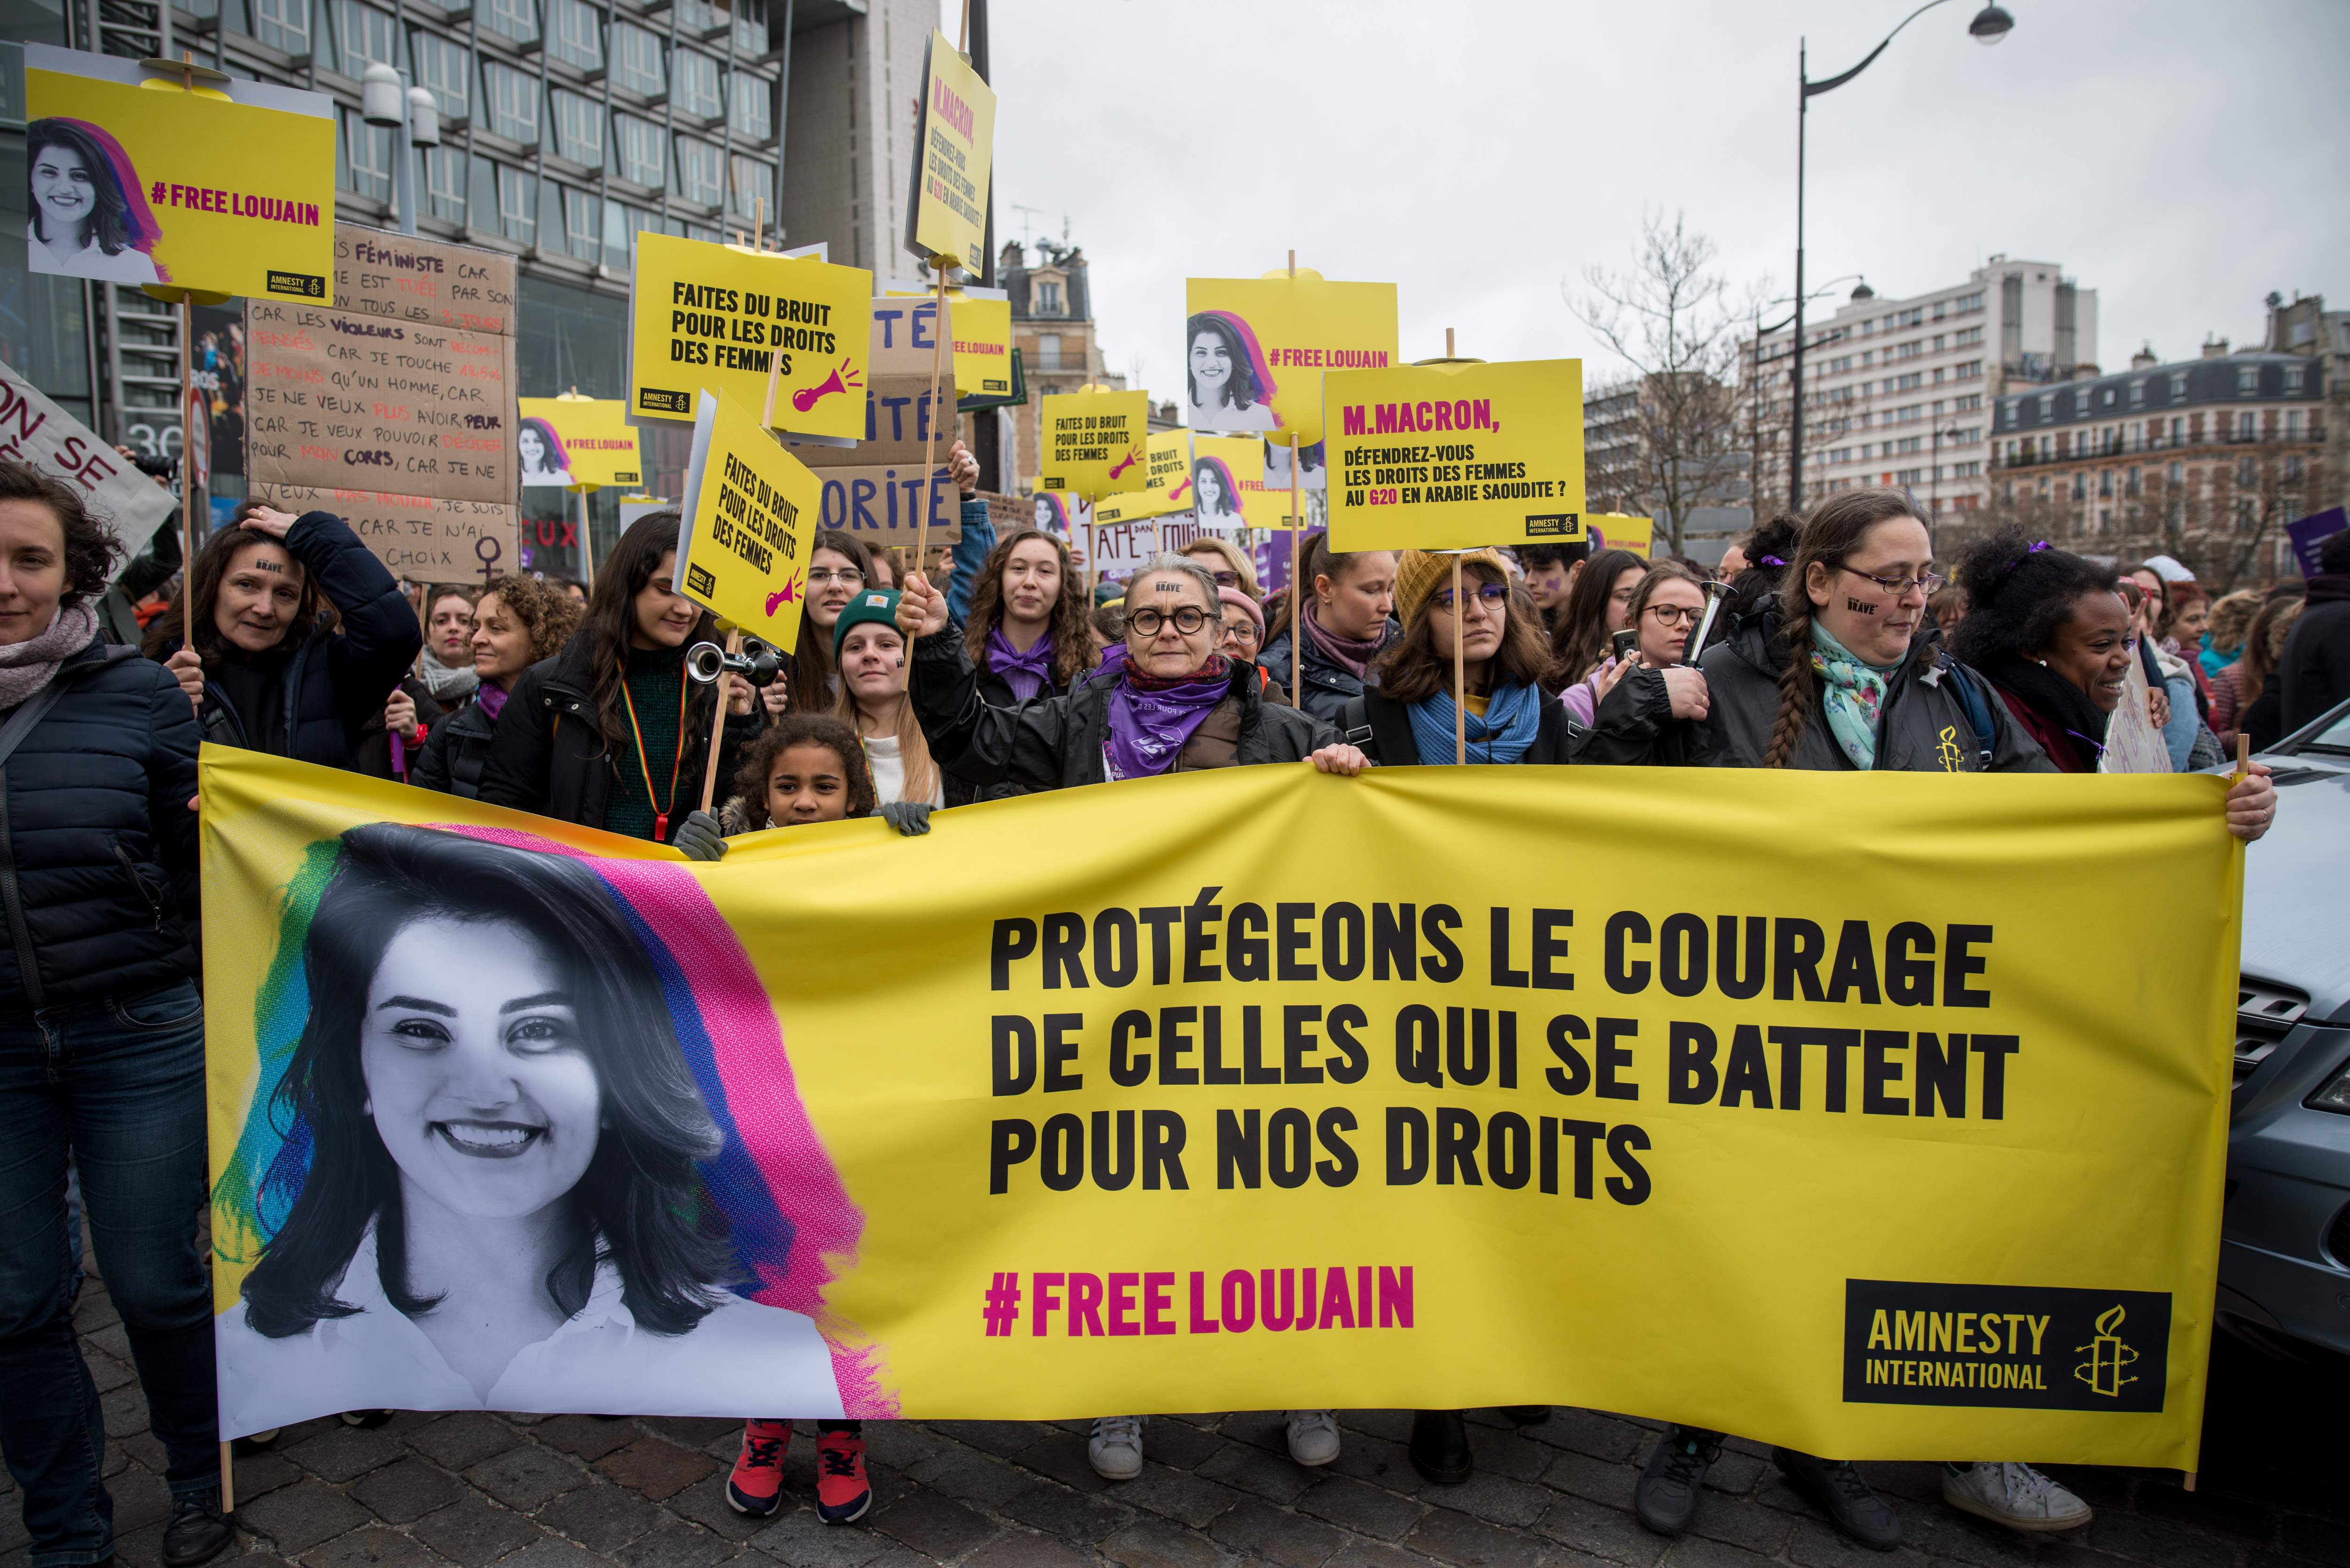 Marketing influence Amnesty International Hivency Le Blog 2